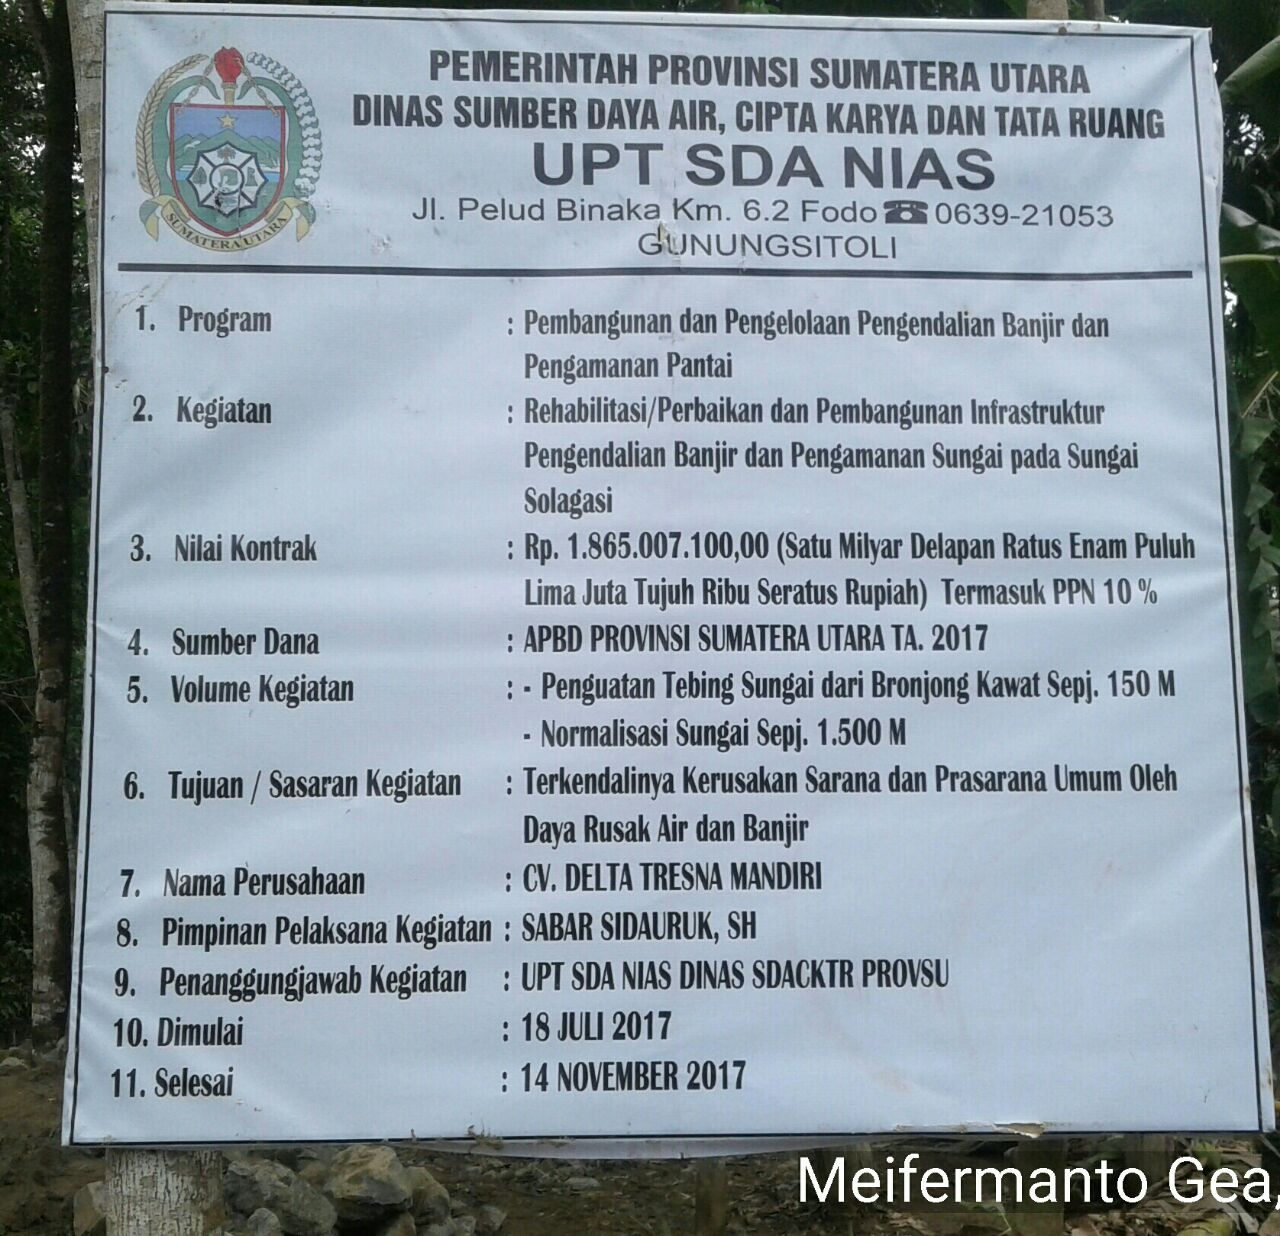 Rehabilitasi Sungai Solagasi Nias Utara Terindikasi Sarat Korupsi Tcash Vaganza 39 Bantal Mobil 3 In 1 Mini Mouse Aksesoris Puterariaucom